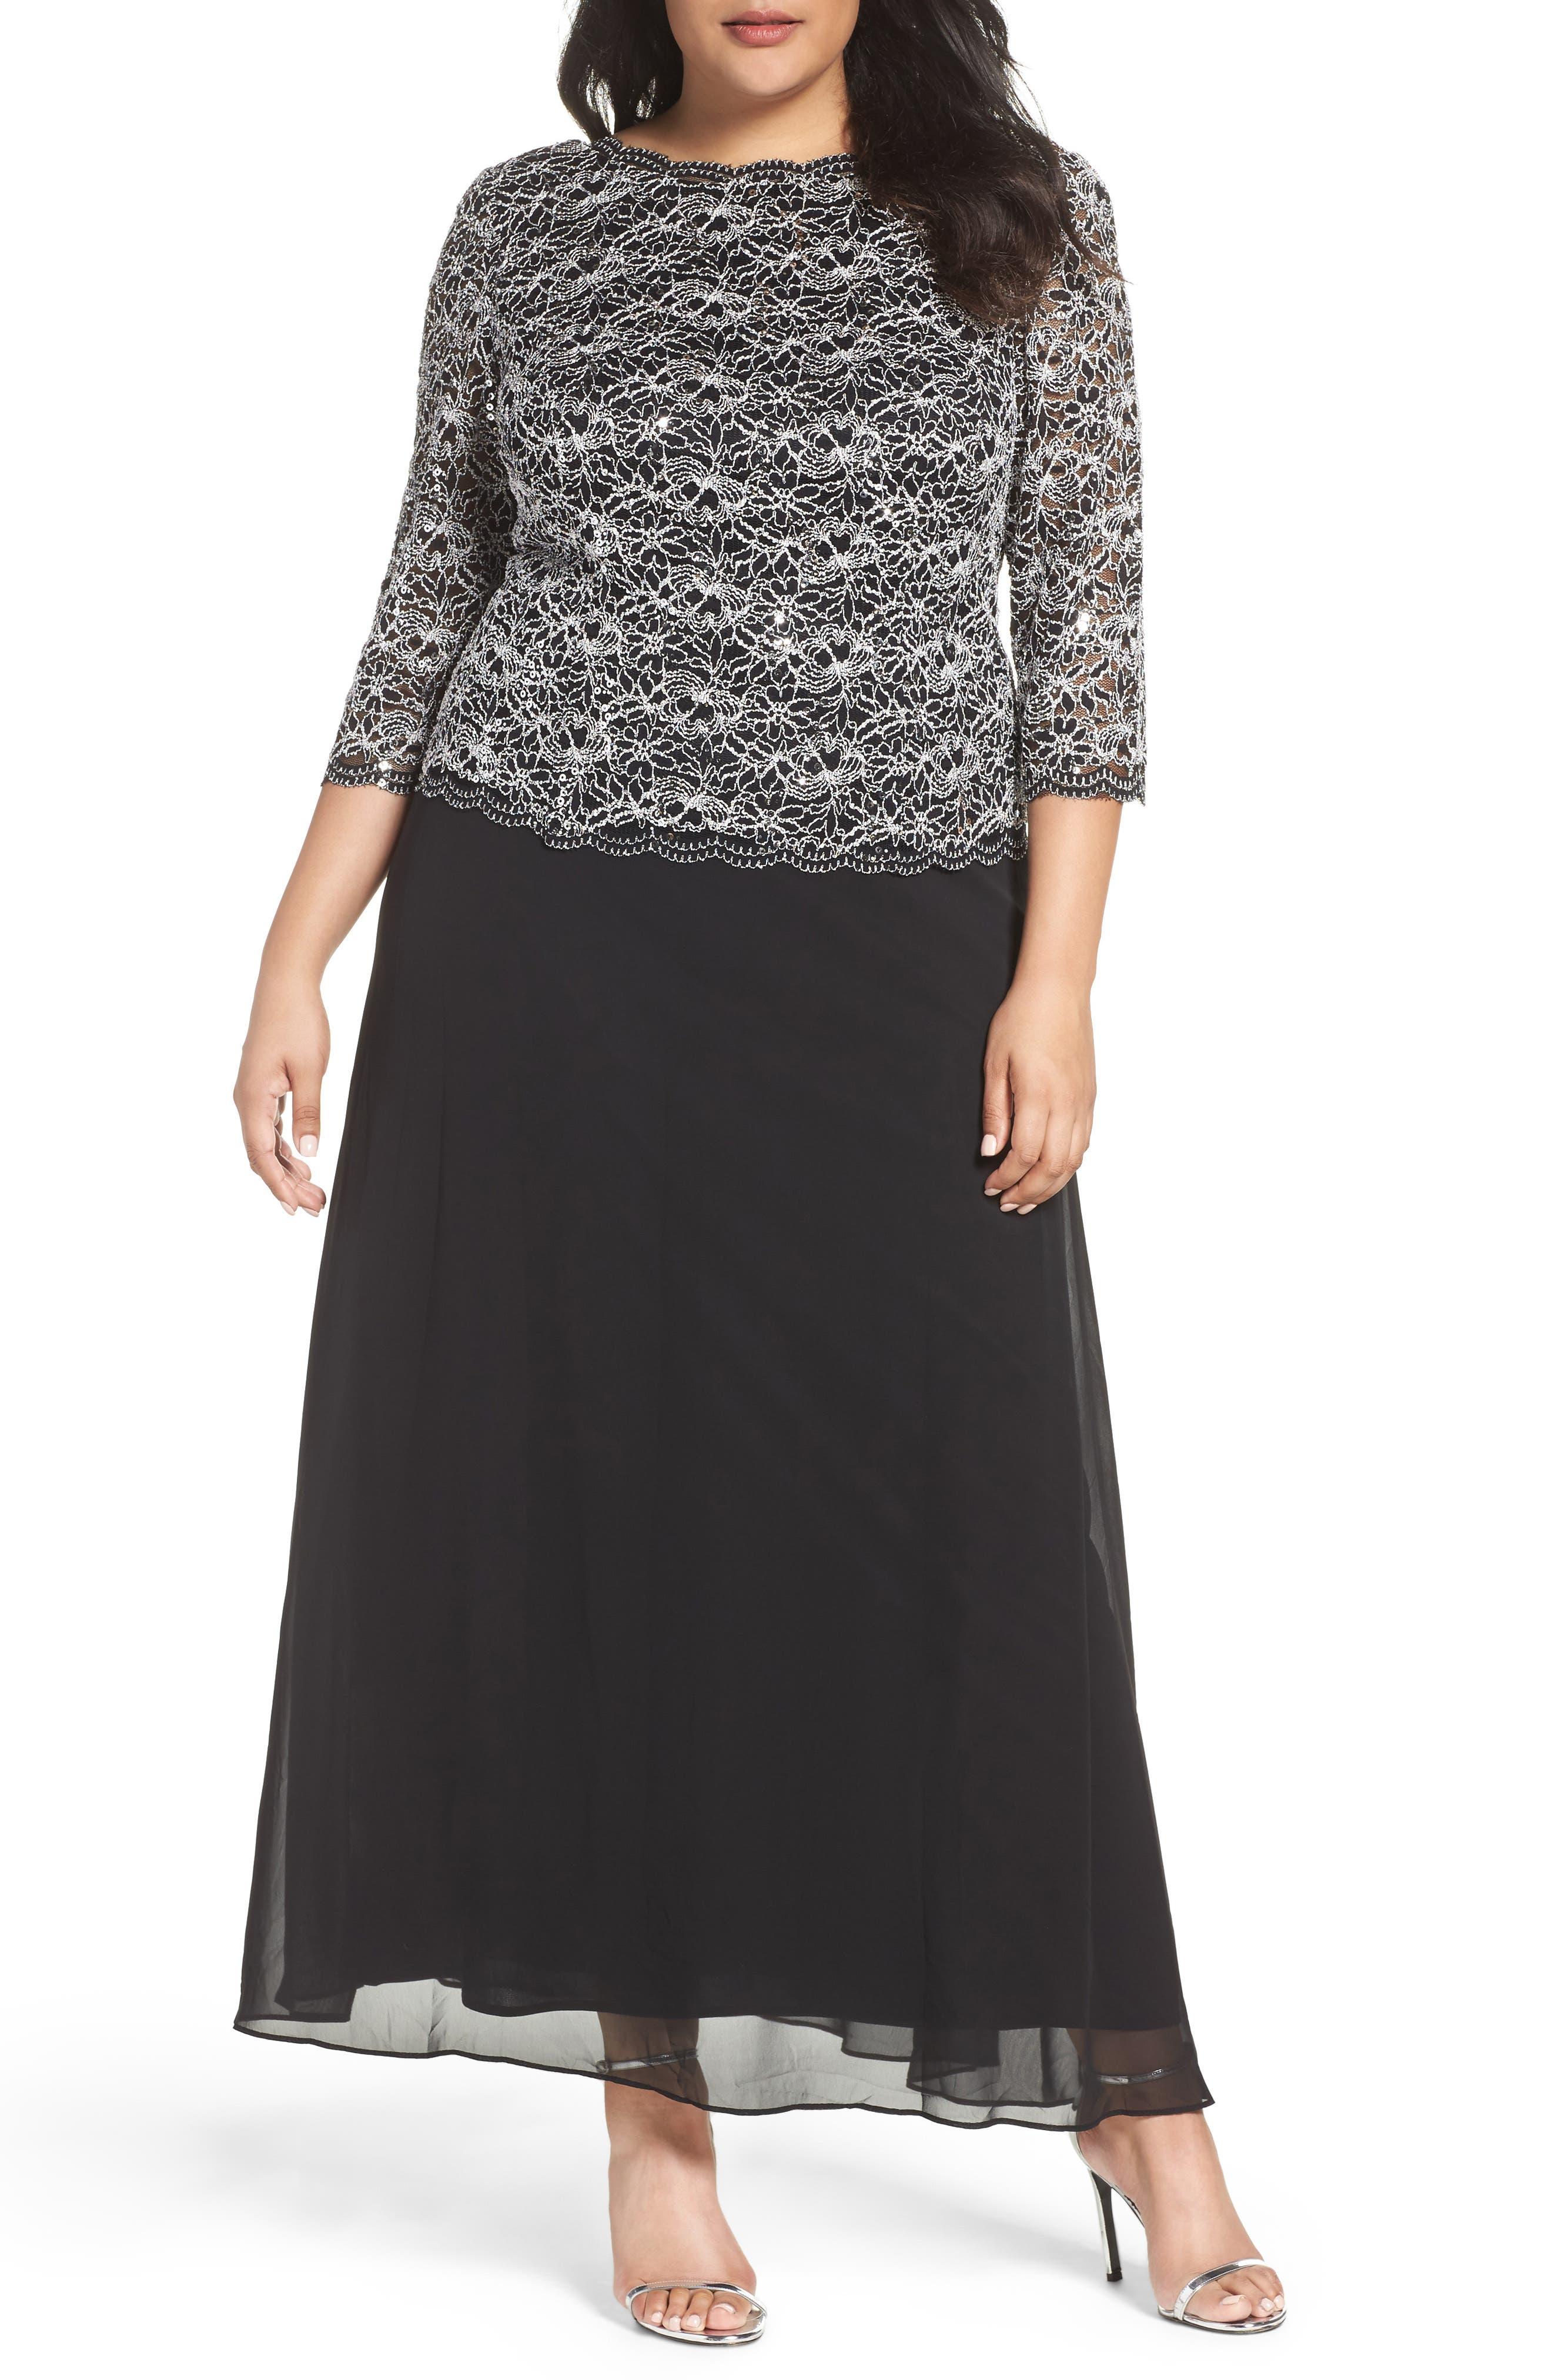 ALEX EVENINGS,                             Mock Two-Piece Lace & Chiffon A-Line Gown,                             Main thumbnail 1, color,                             006